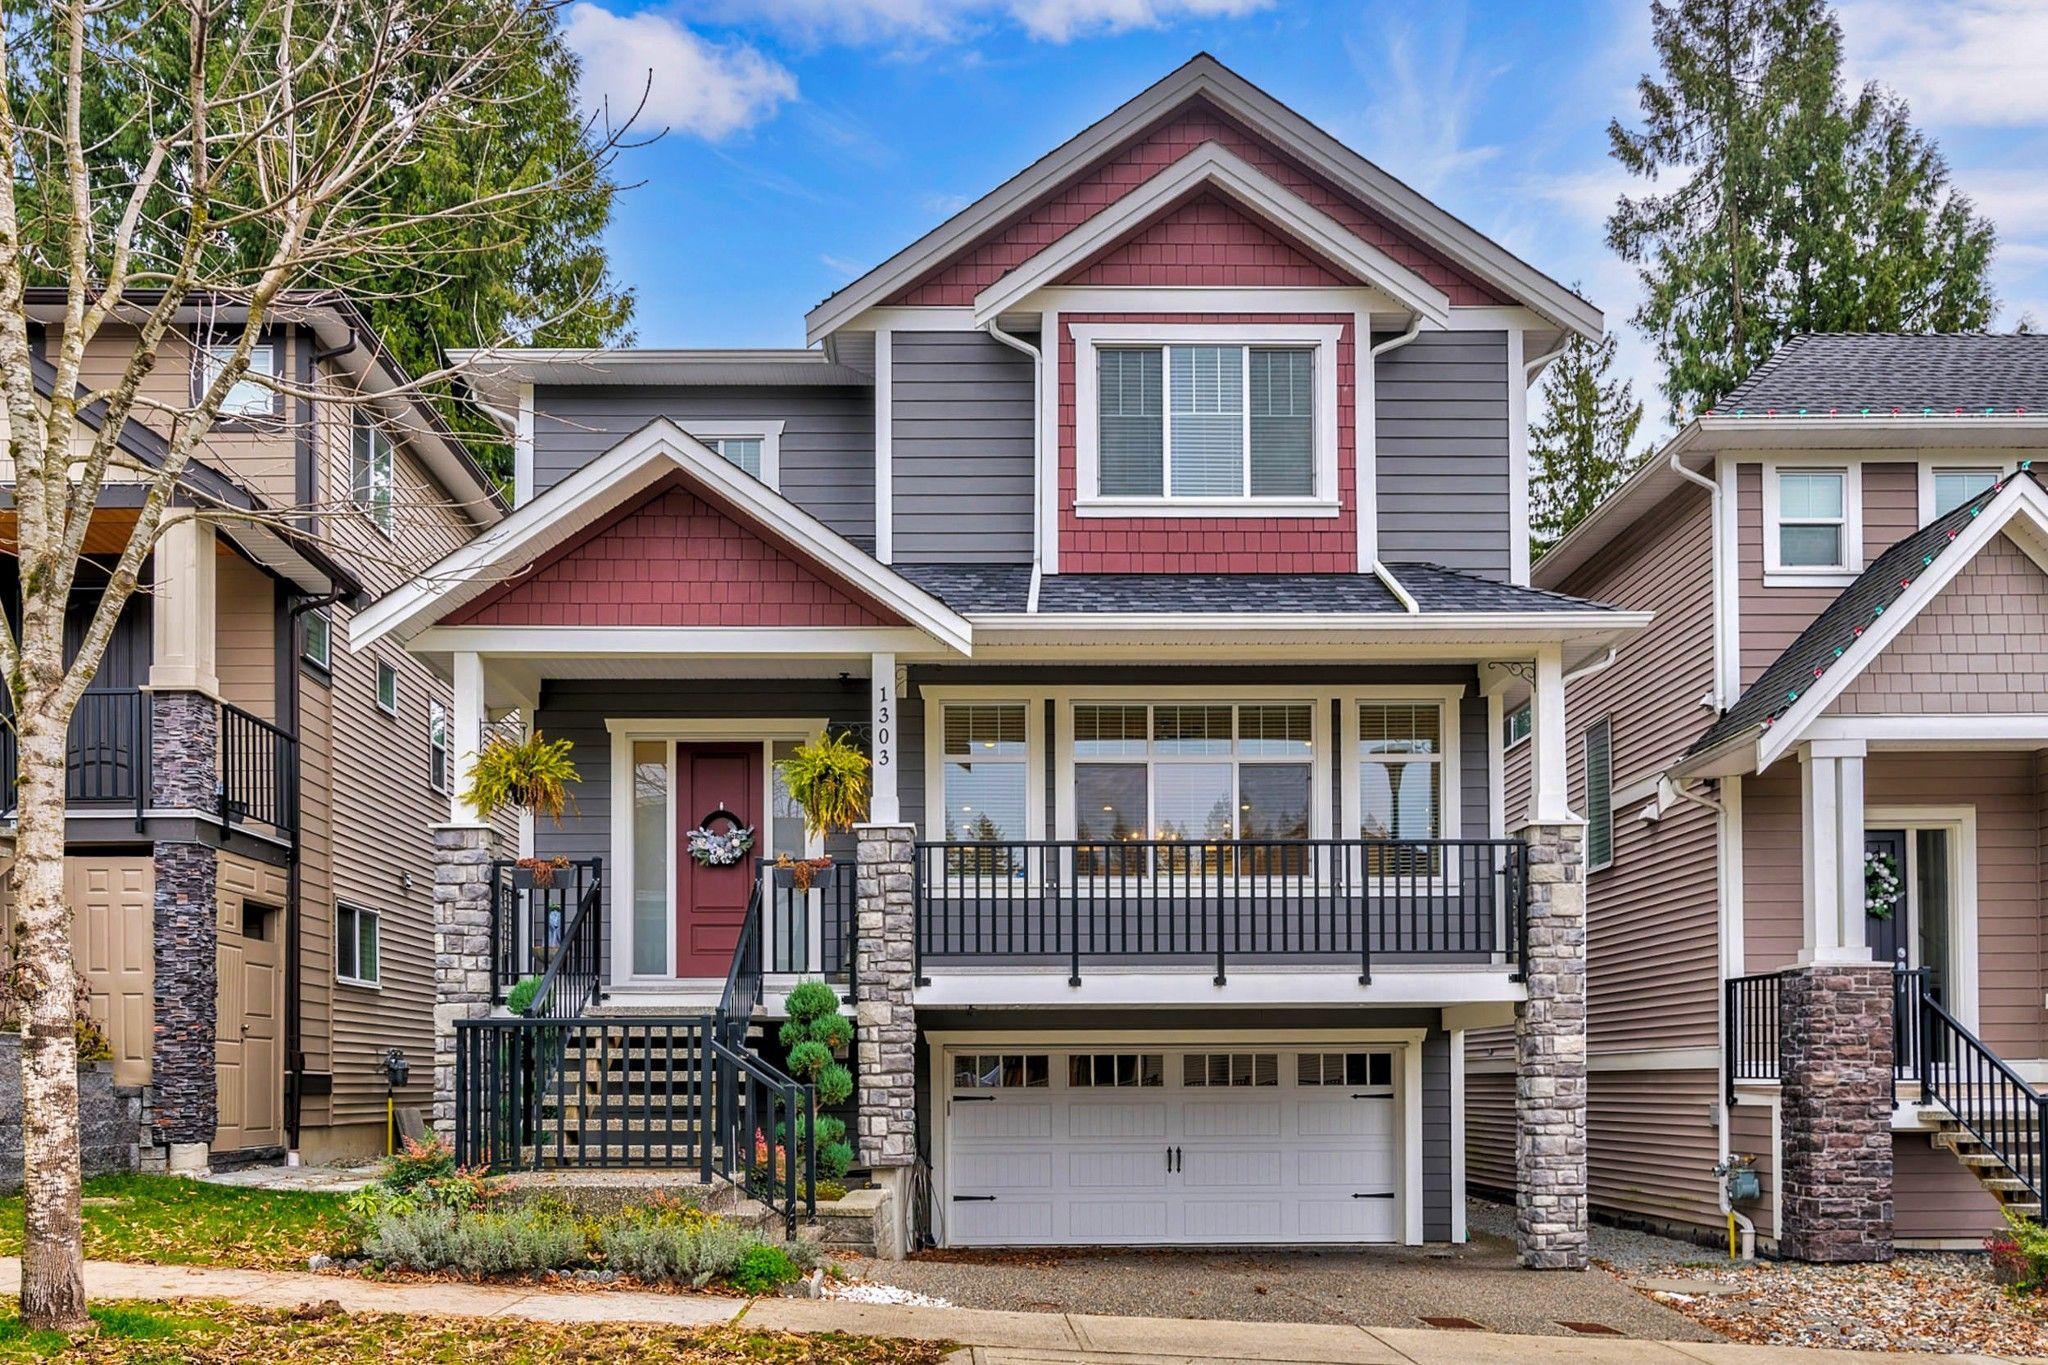 Photo 2: Photos: 1303 Hollybrook Street in Coquitlam: Burke Mountain House for sale : MLS®# R2423196